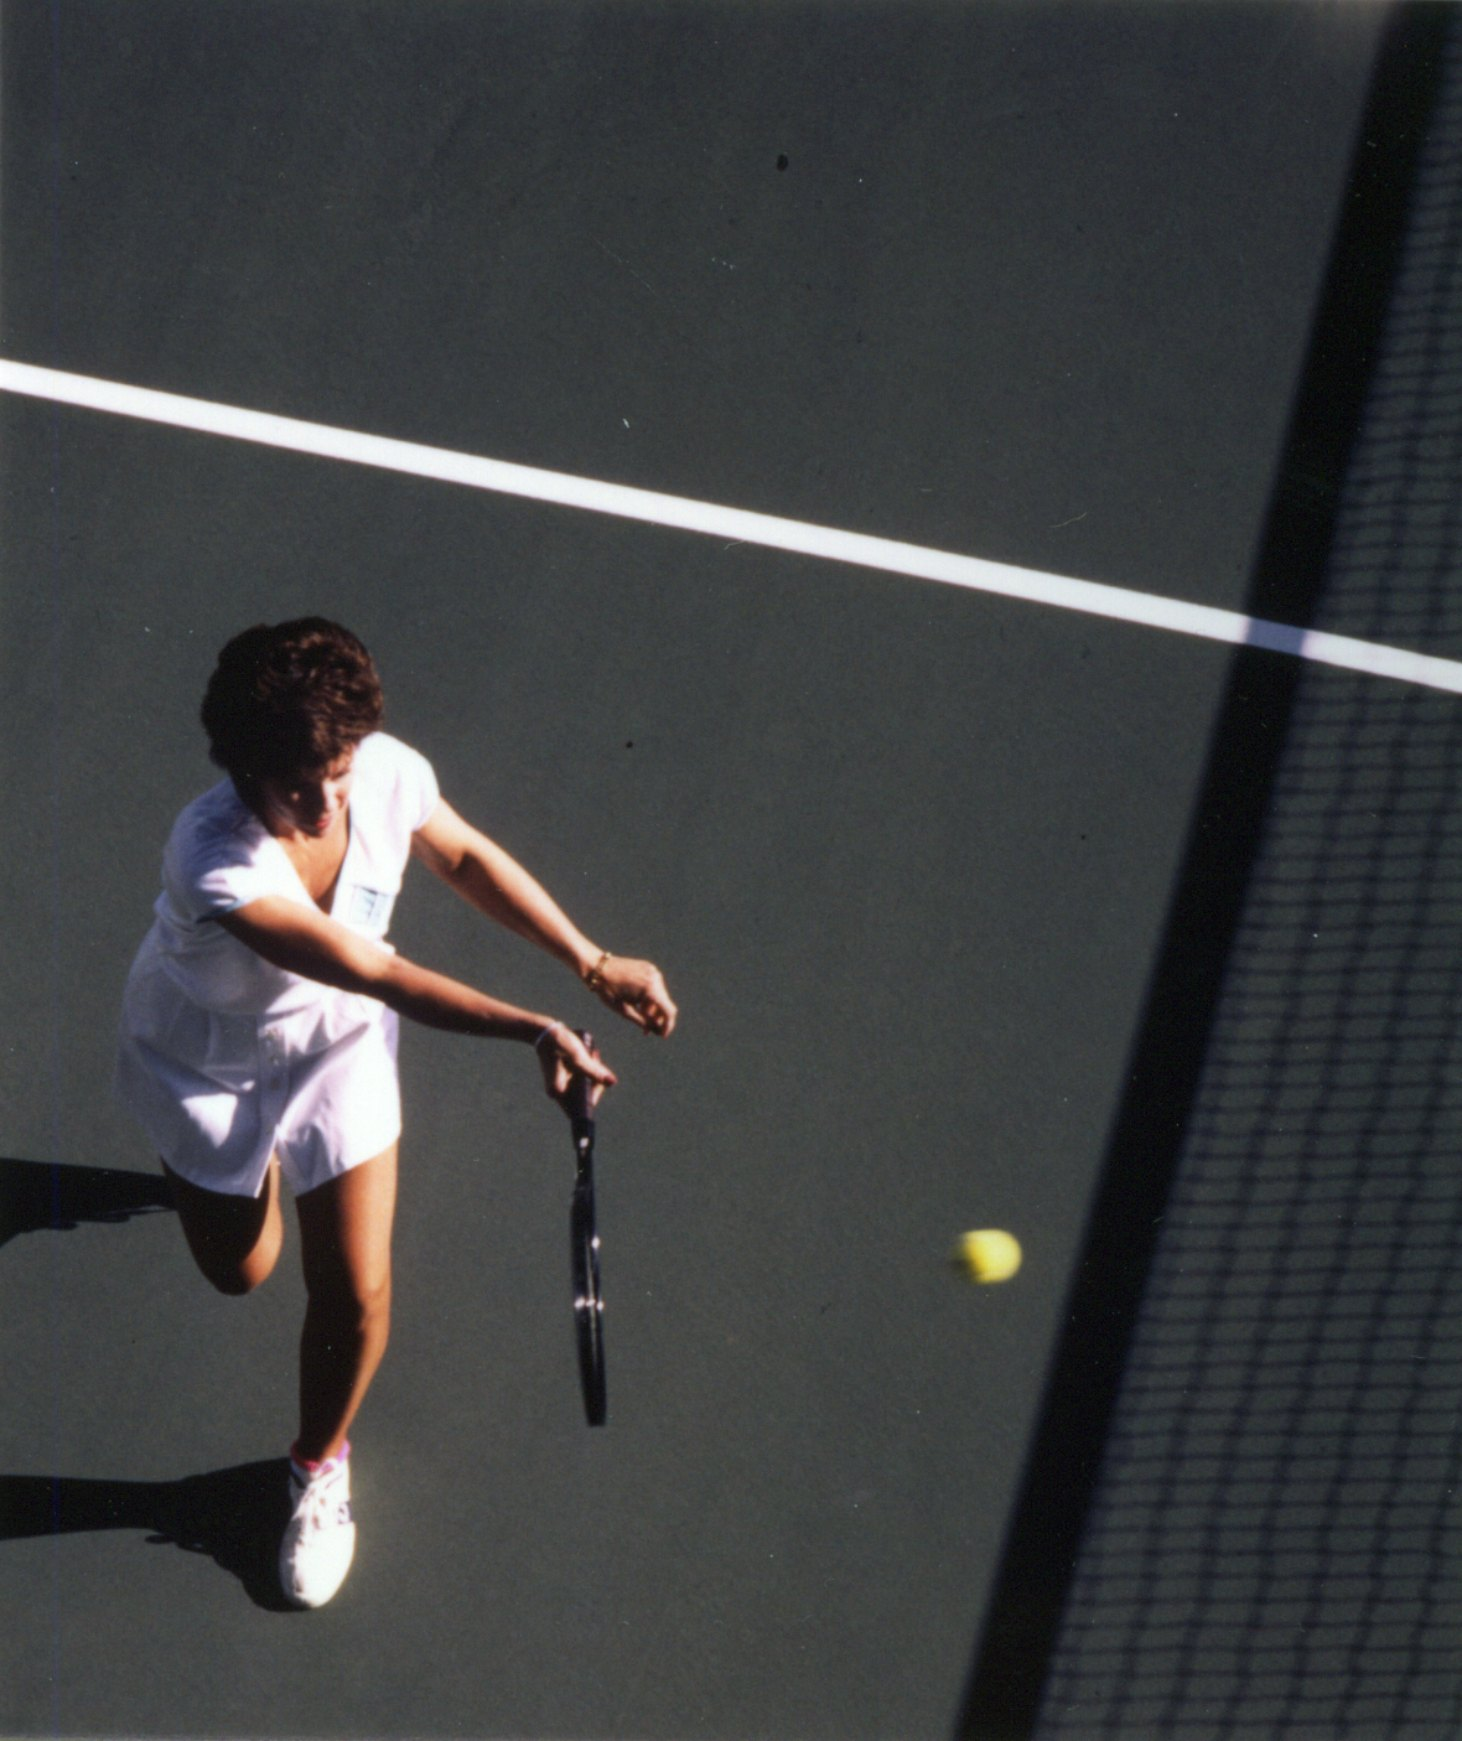 9e3b4b806ee6b8e21972c11569fdf88f_tennisplayer